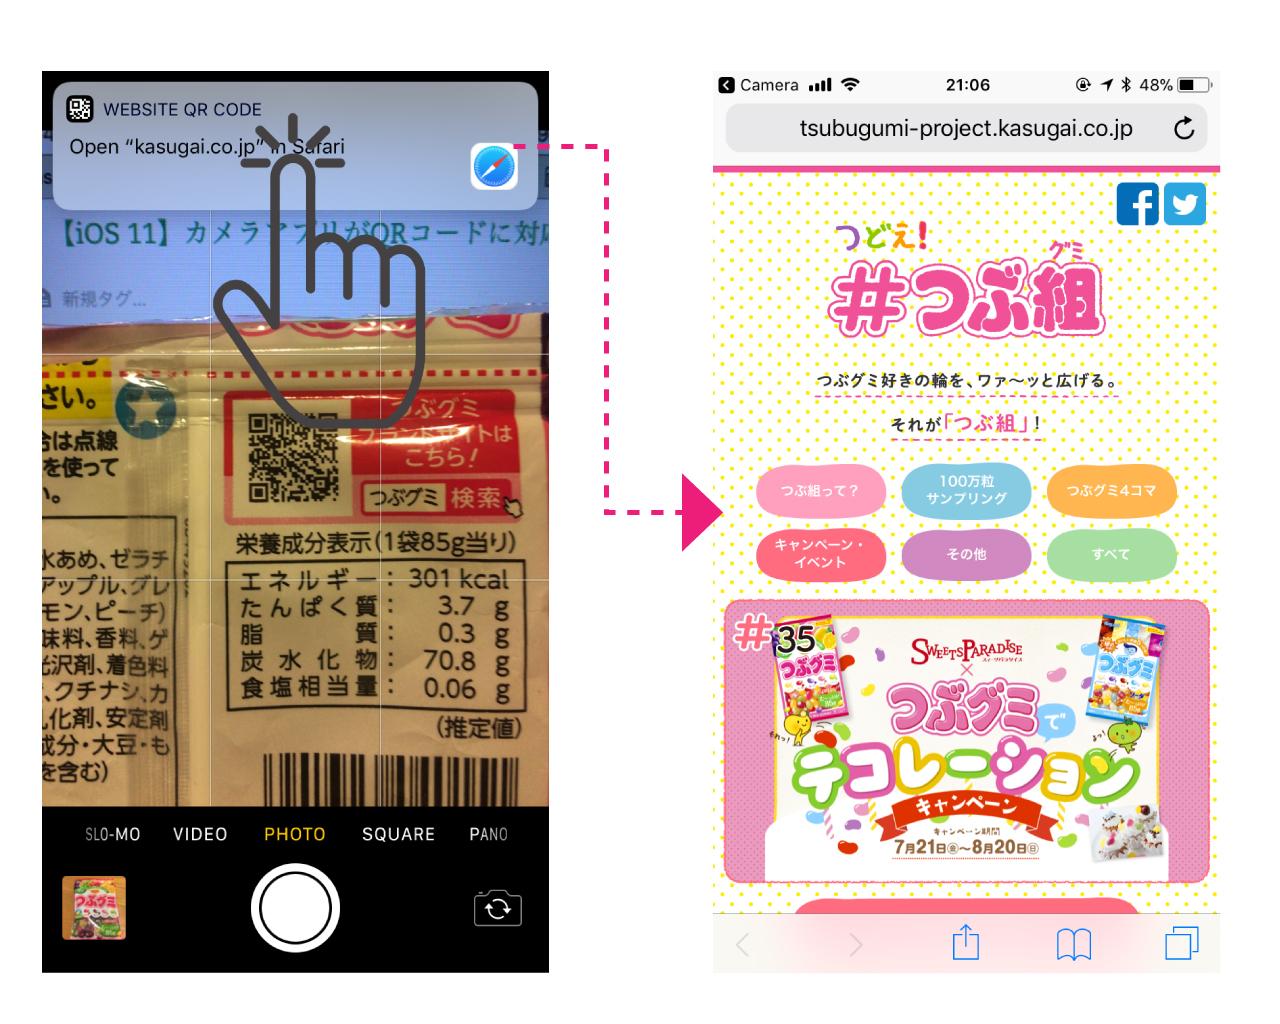 iphone-ipad-ios11-qr-code-camera-loading-3